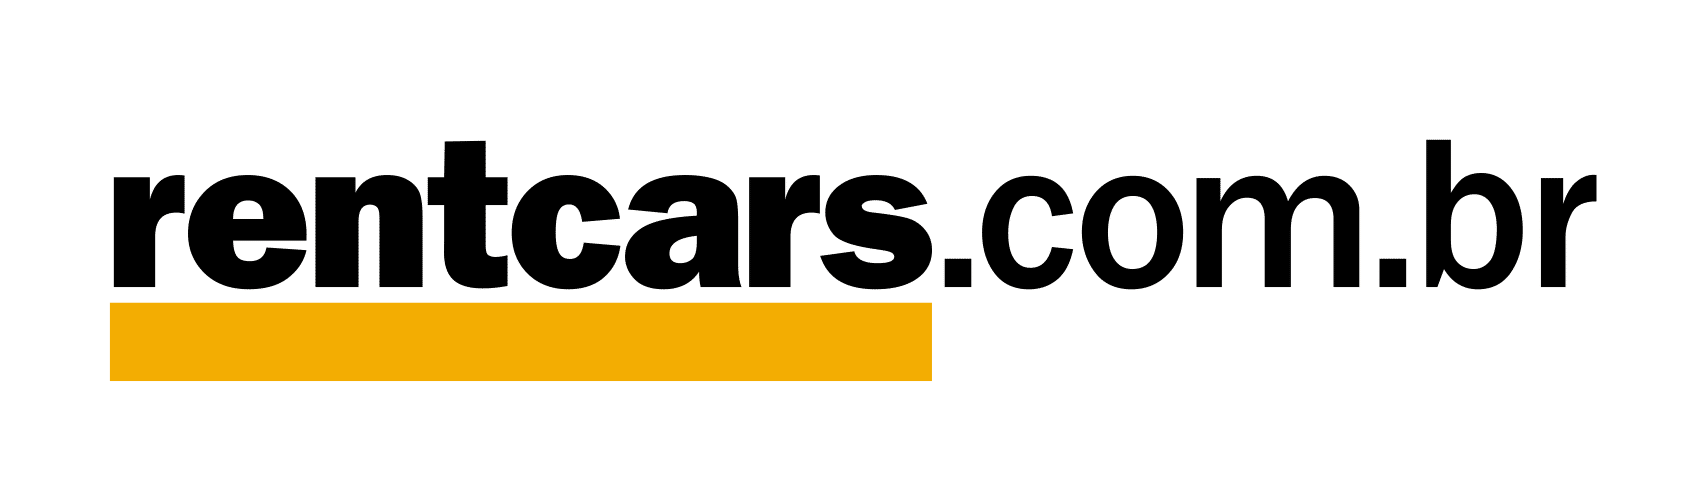 Rentcars logo